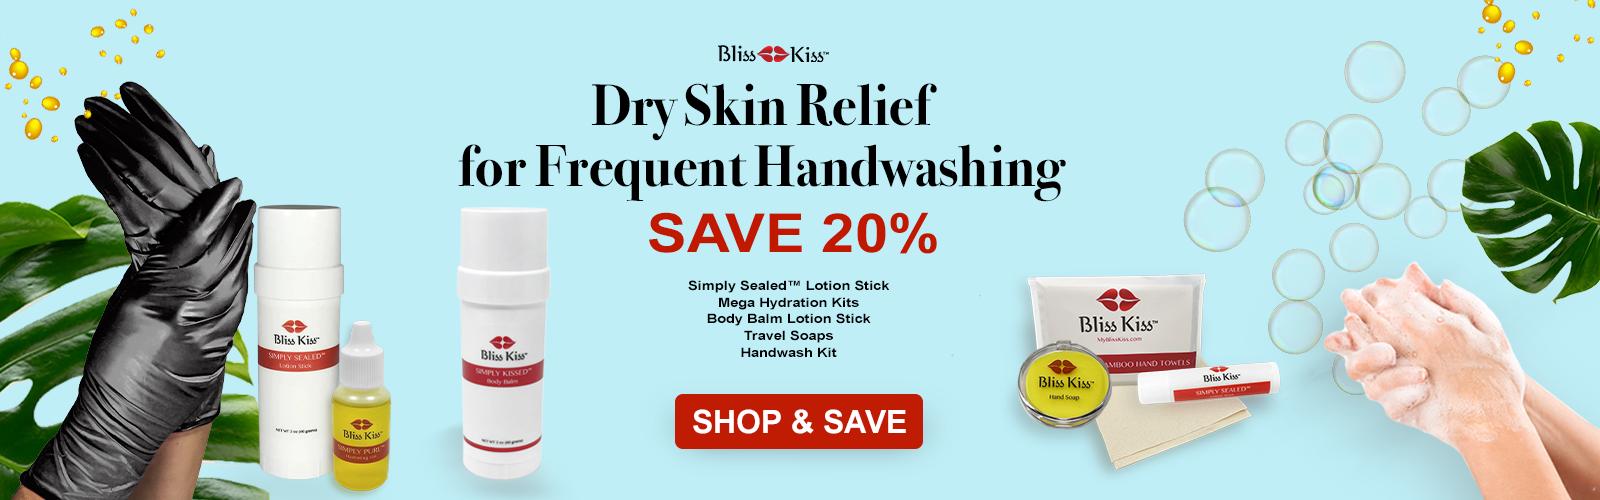 healthy-handwashing-banner-20-artboard-1.png